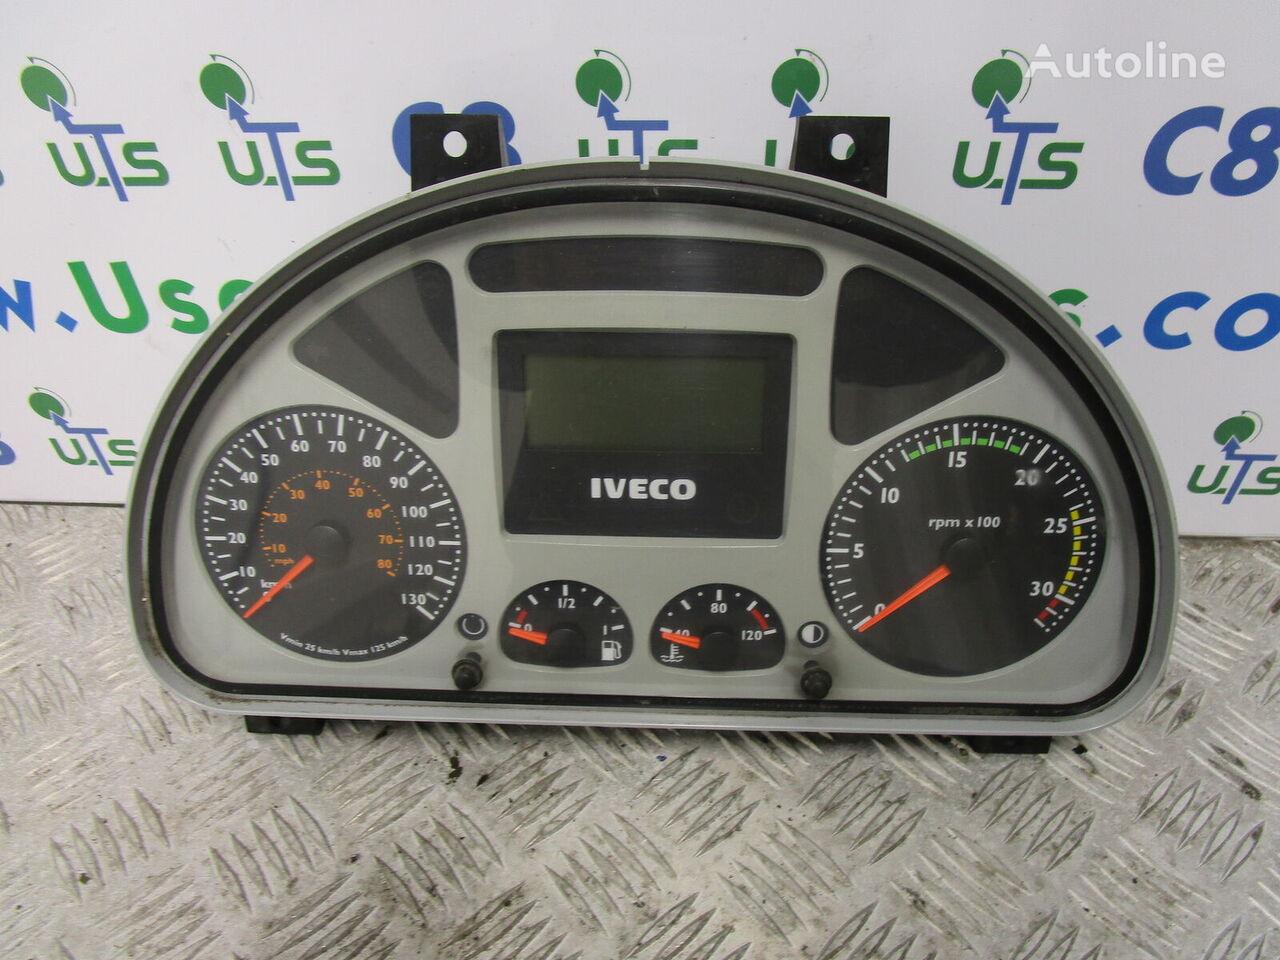 панель приборов IVECO TECTOR CLOCK CLUSTER P/NO (504025357) для грузовика IVECO